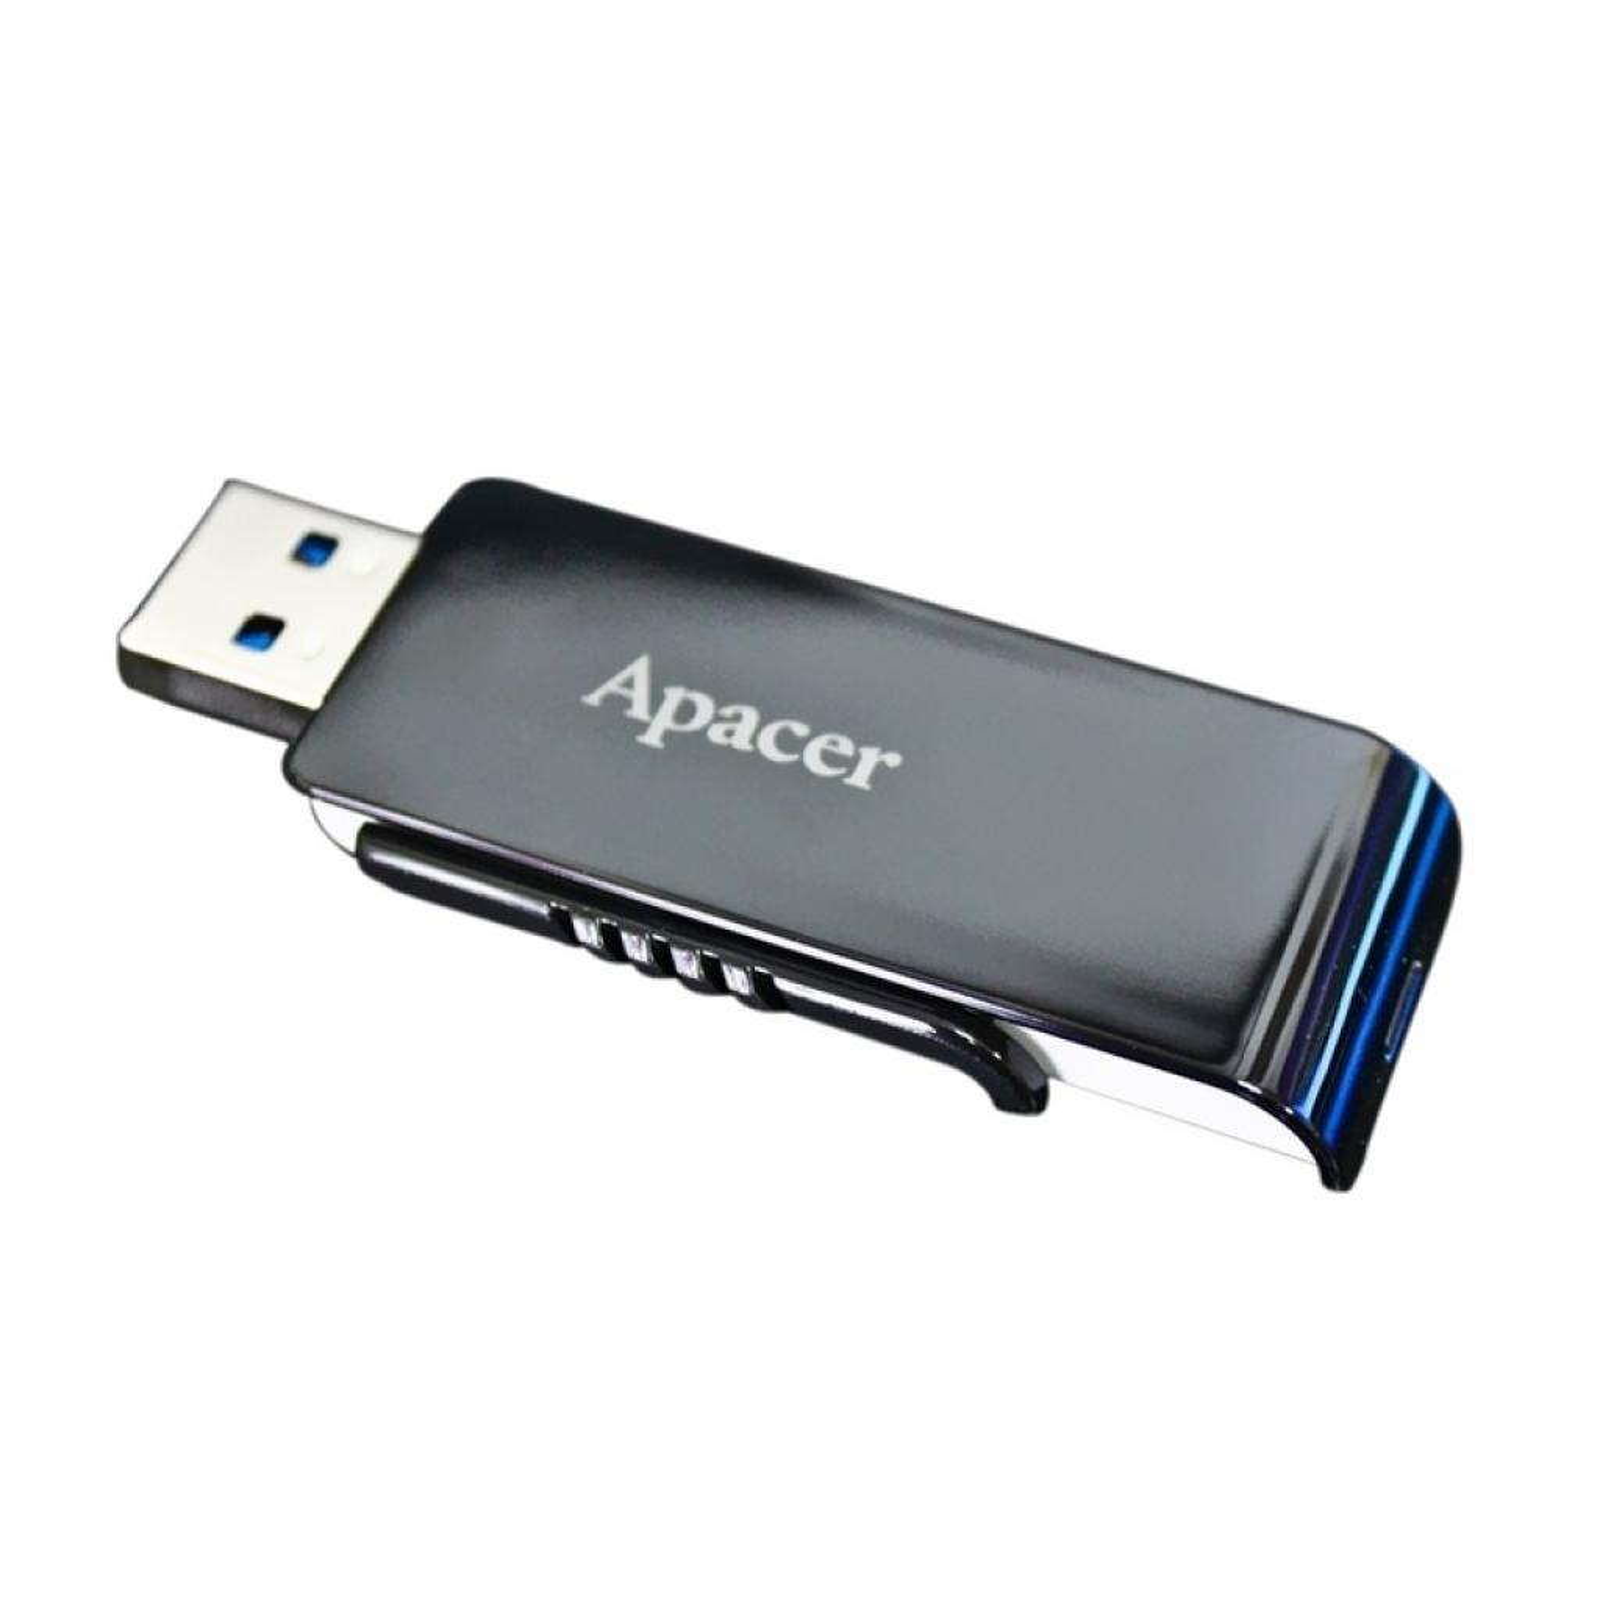 USB флеш накопитель 32GB AH350 Black RP USB3.0 Apacer (AP32GAH350B-1) изображение 9